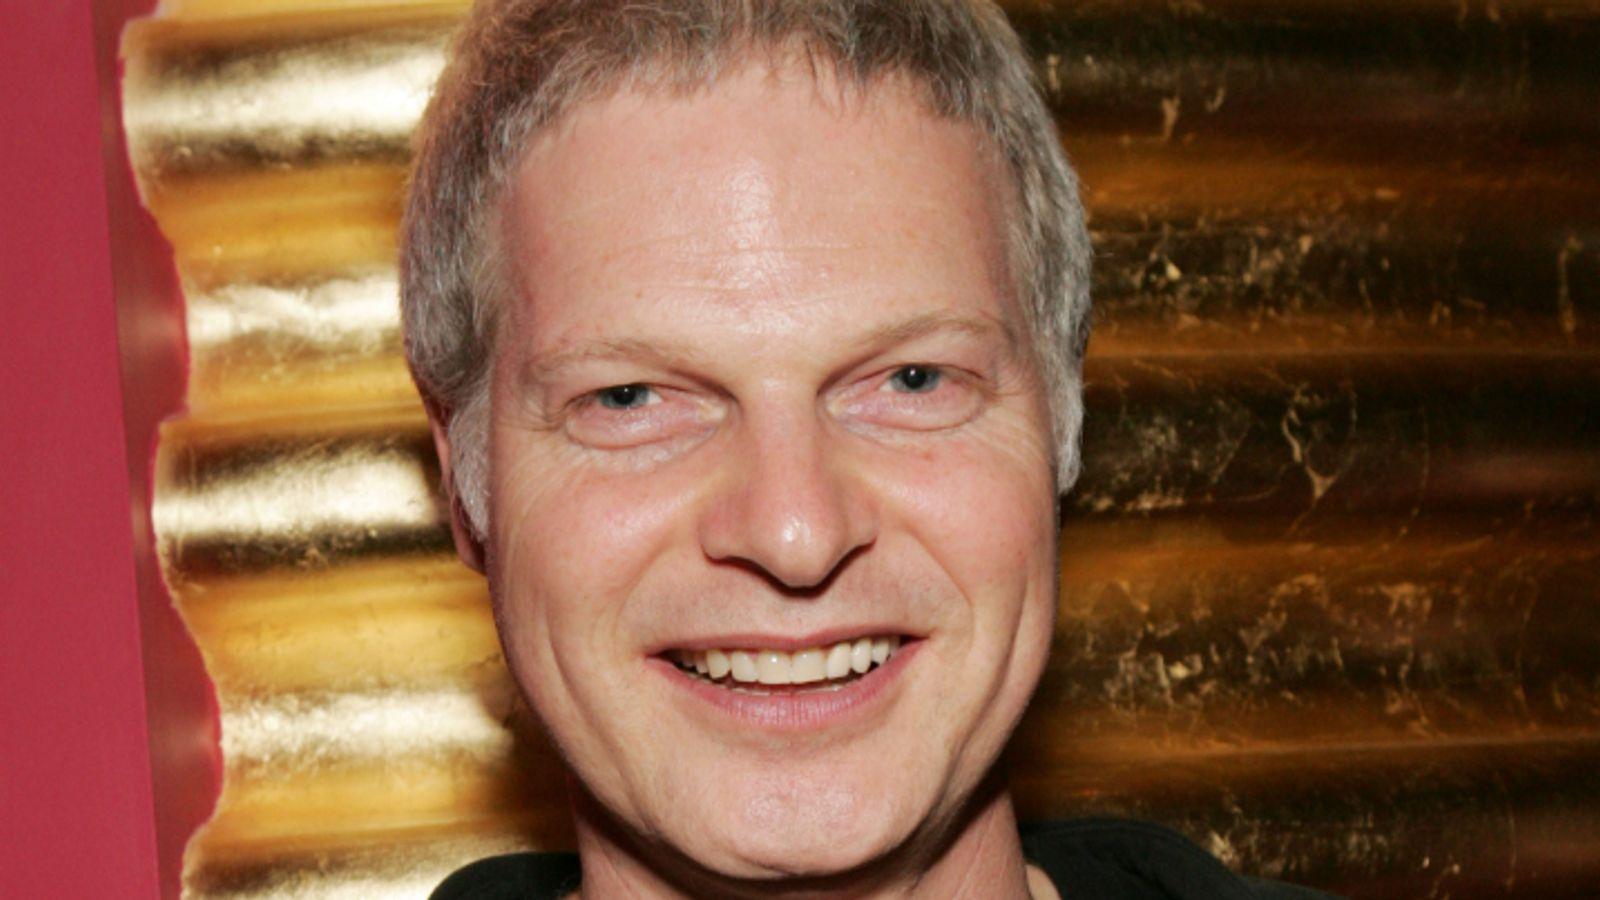 Film producer Steve Bing, ex-partner of Liz Hurley, dies